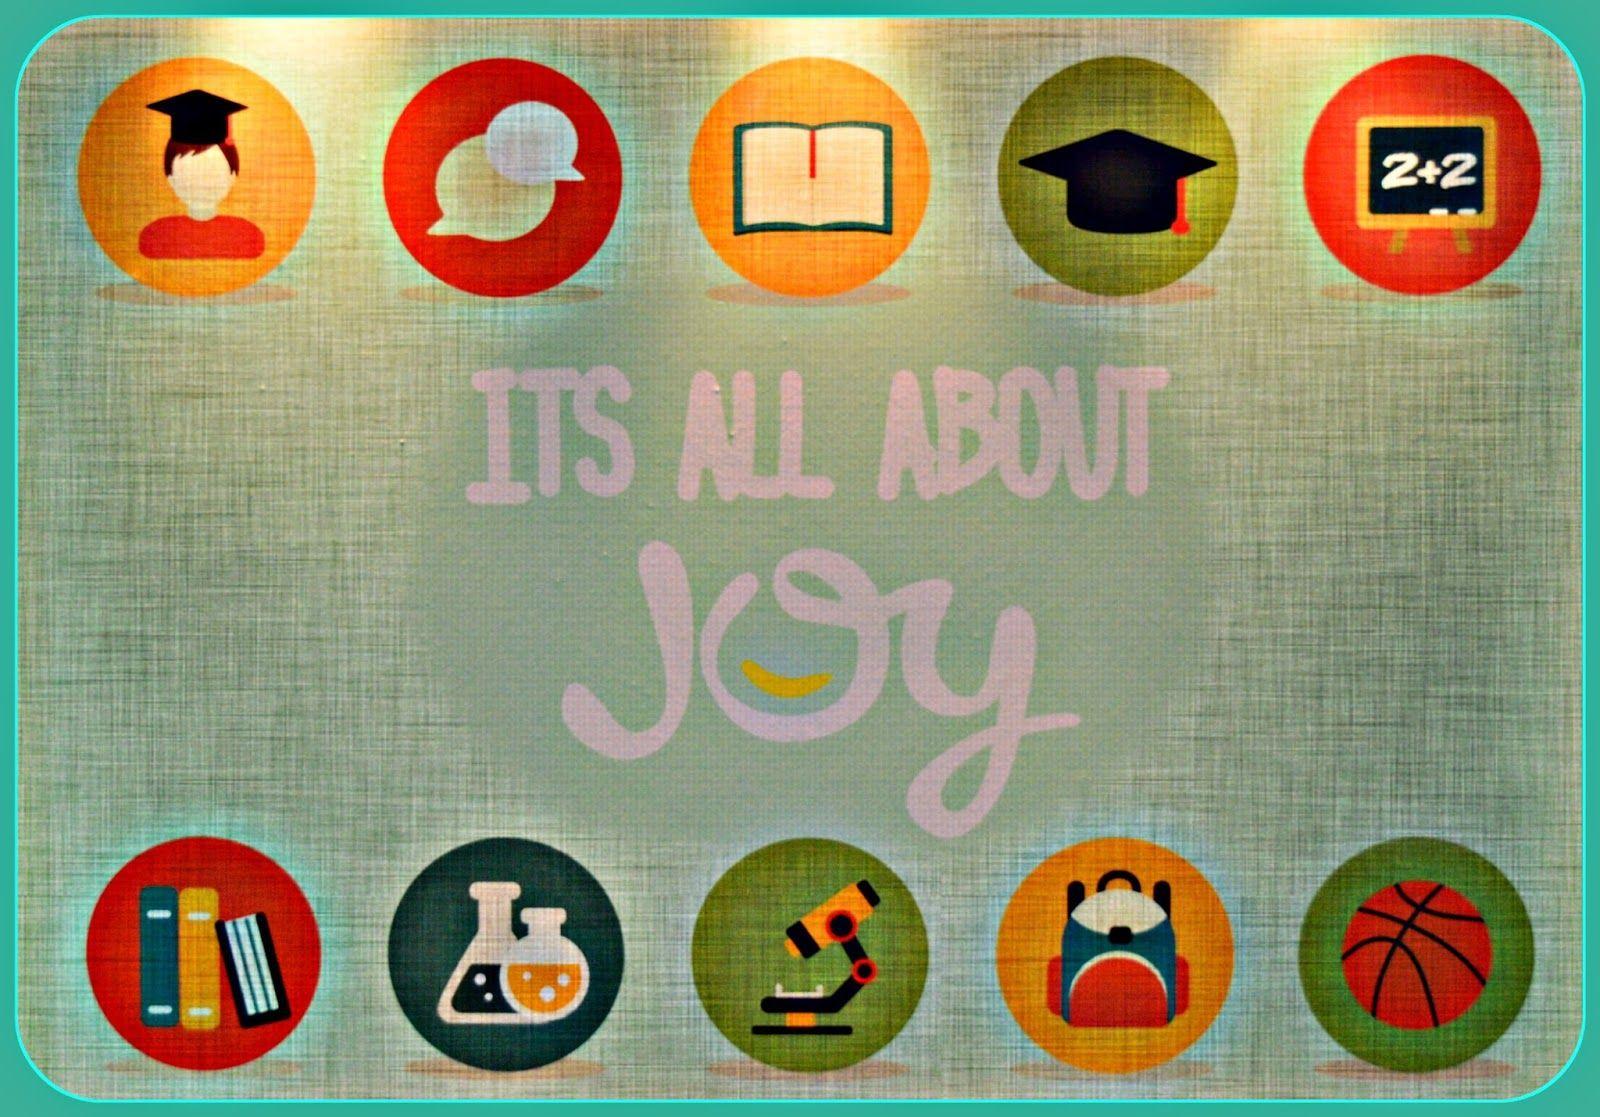 GDK, Joy by analosimo, ΣΕΡΡΕΣ, ΒΙΒΛΙΟΠΩΛΕΙΑ, ΑΝΑΛΩΣΙΜΑ ΕΙΔΗ, ΧΑΡΤΟΠΩΛΕΙΑ,